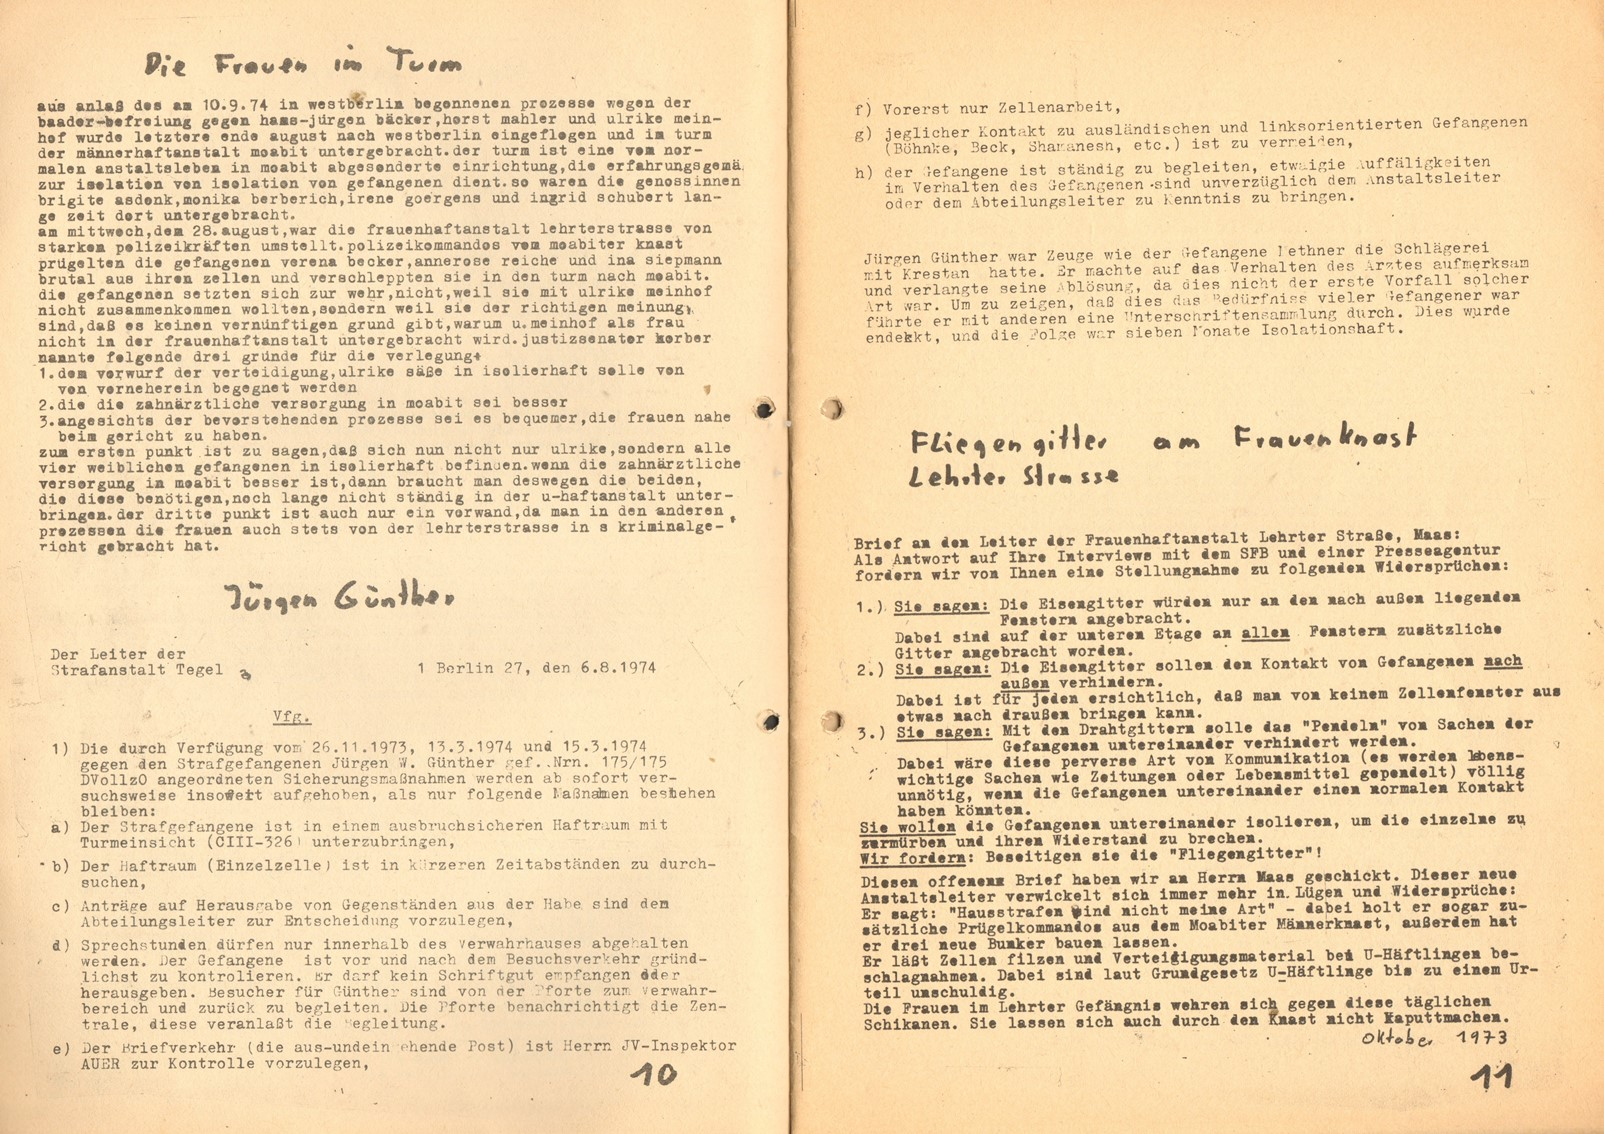 Berlin_RH_1974_Terror_im_Knast_06